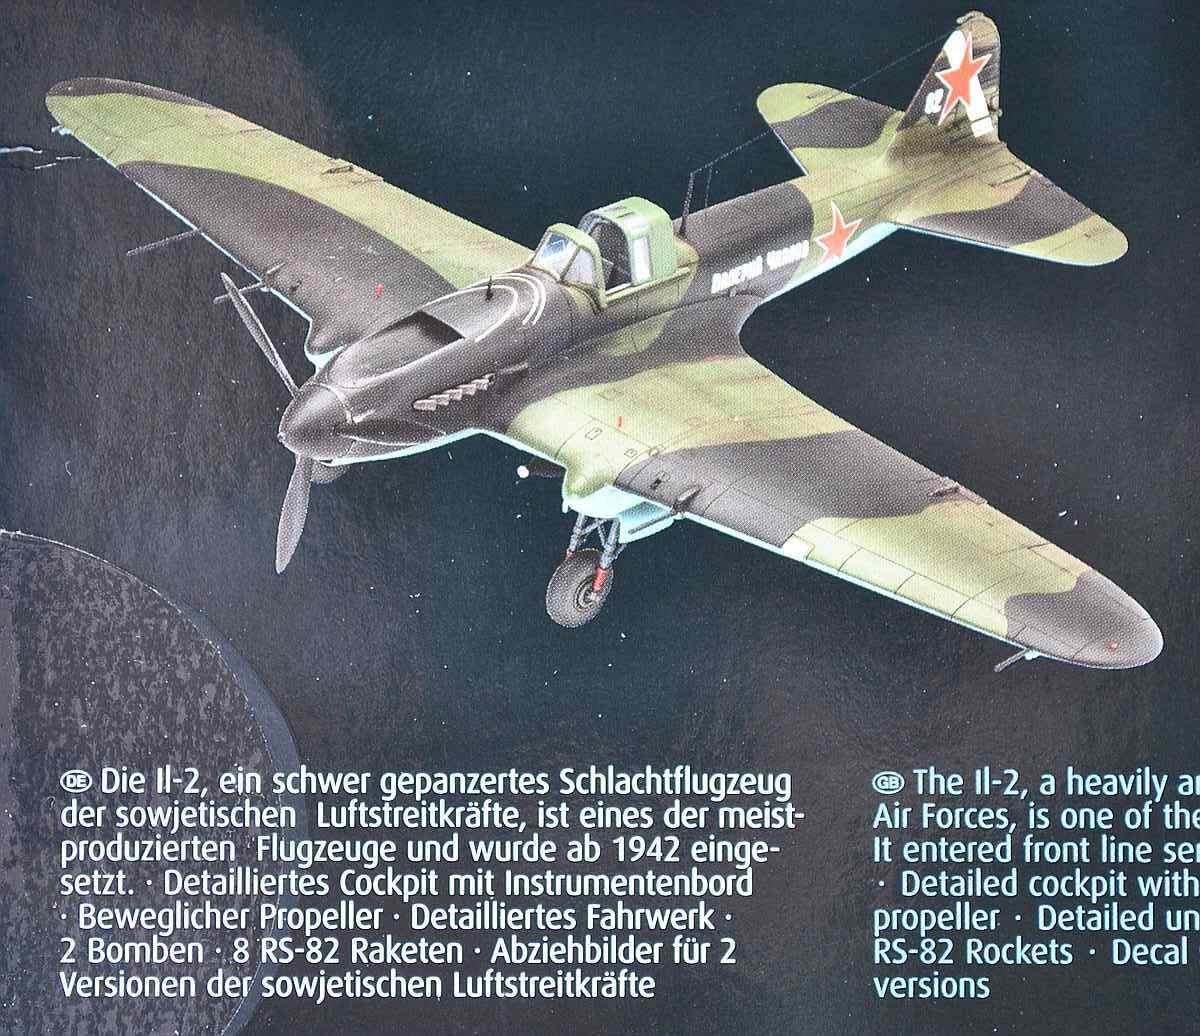 Revell-03932-Il-2-Stormovik-5 Iljuschin Il-2 in 1:48 von Revell (03932)